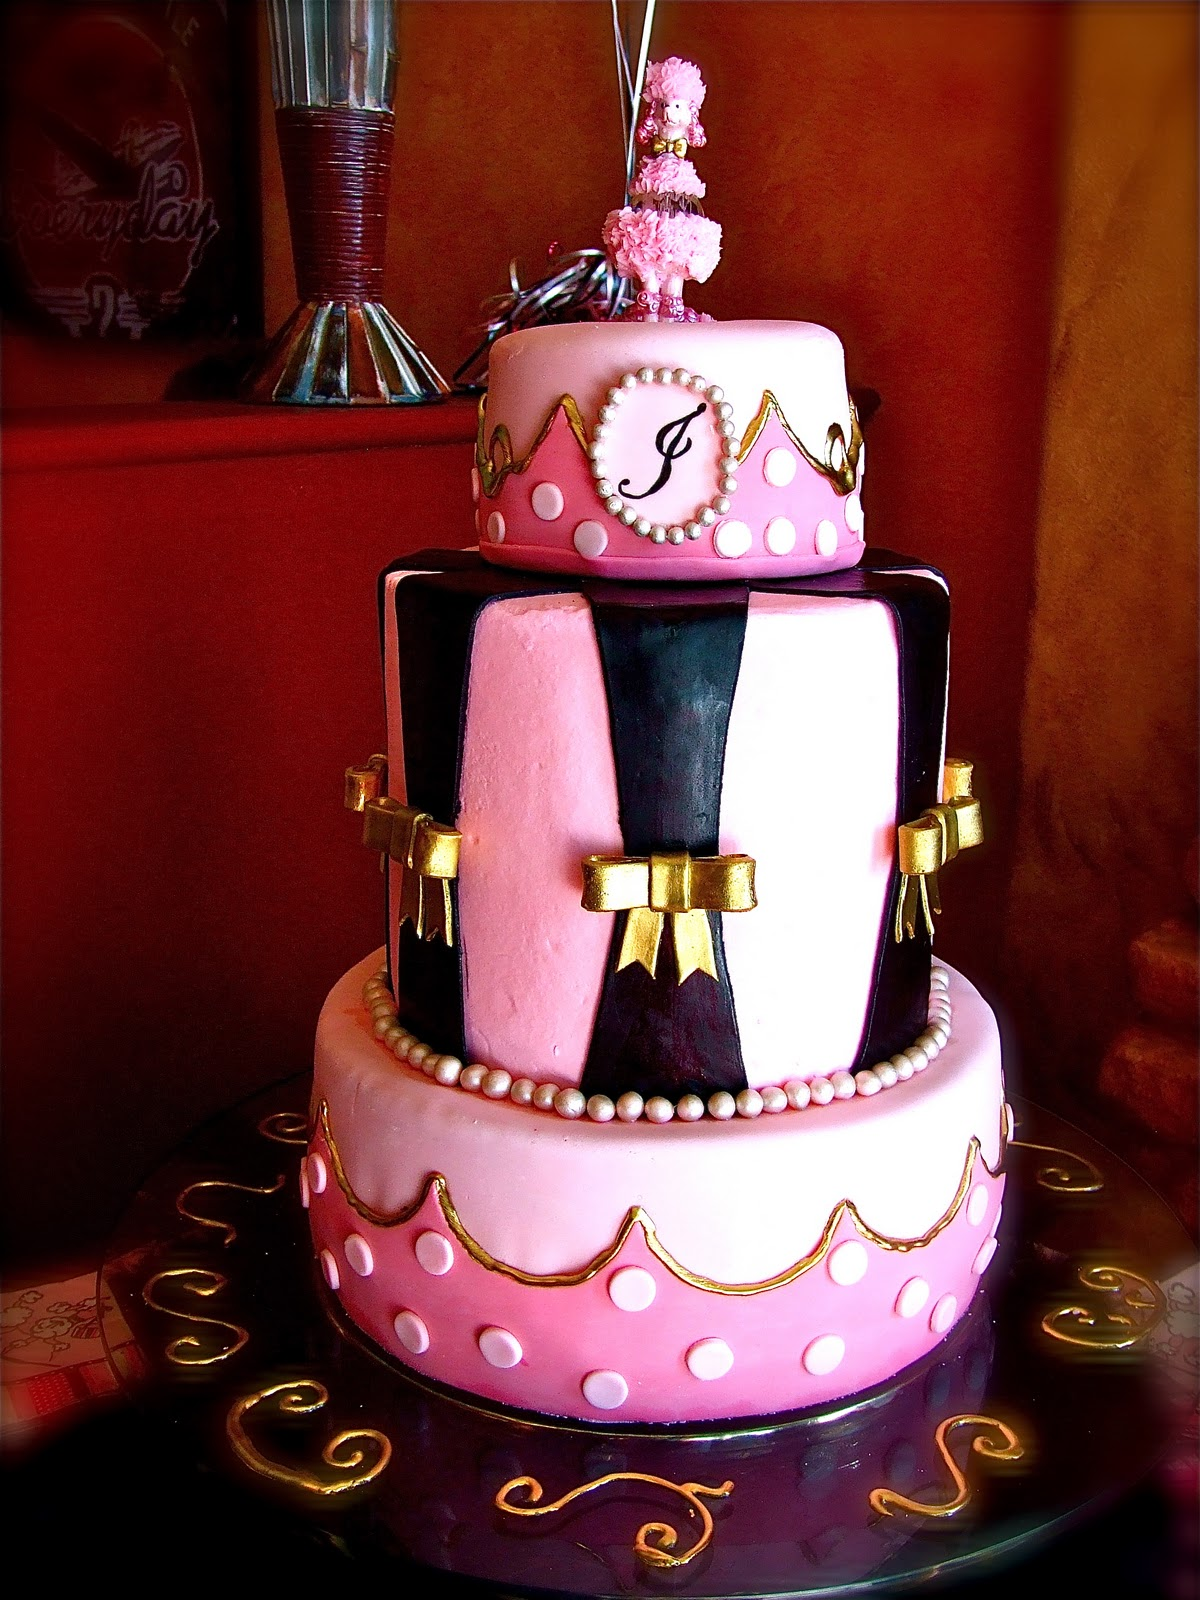 Dream Cakes: Paris Party